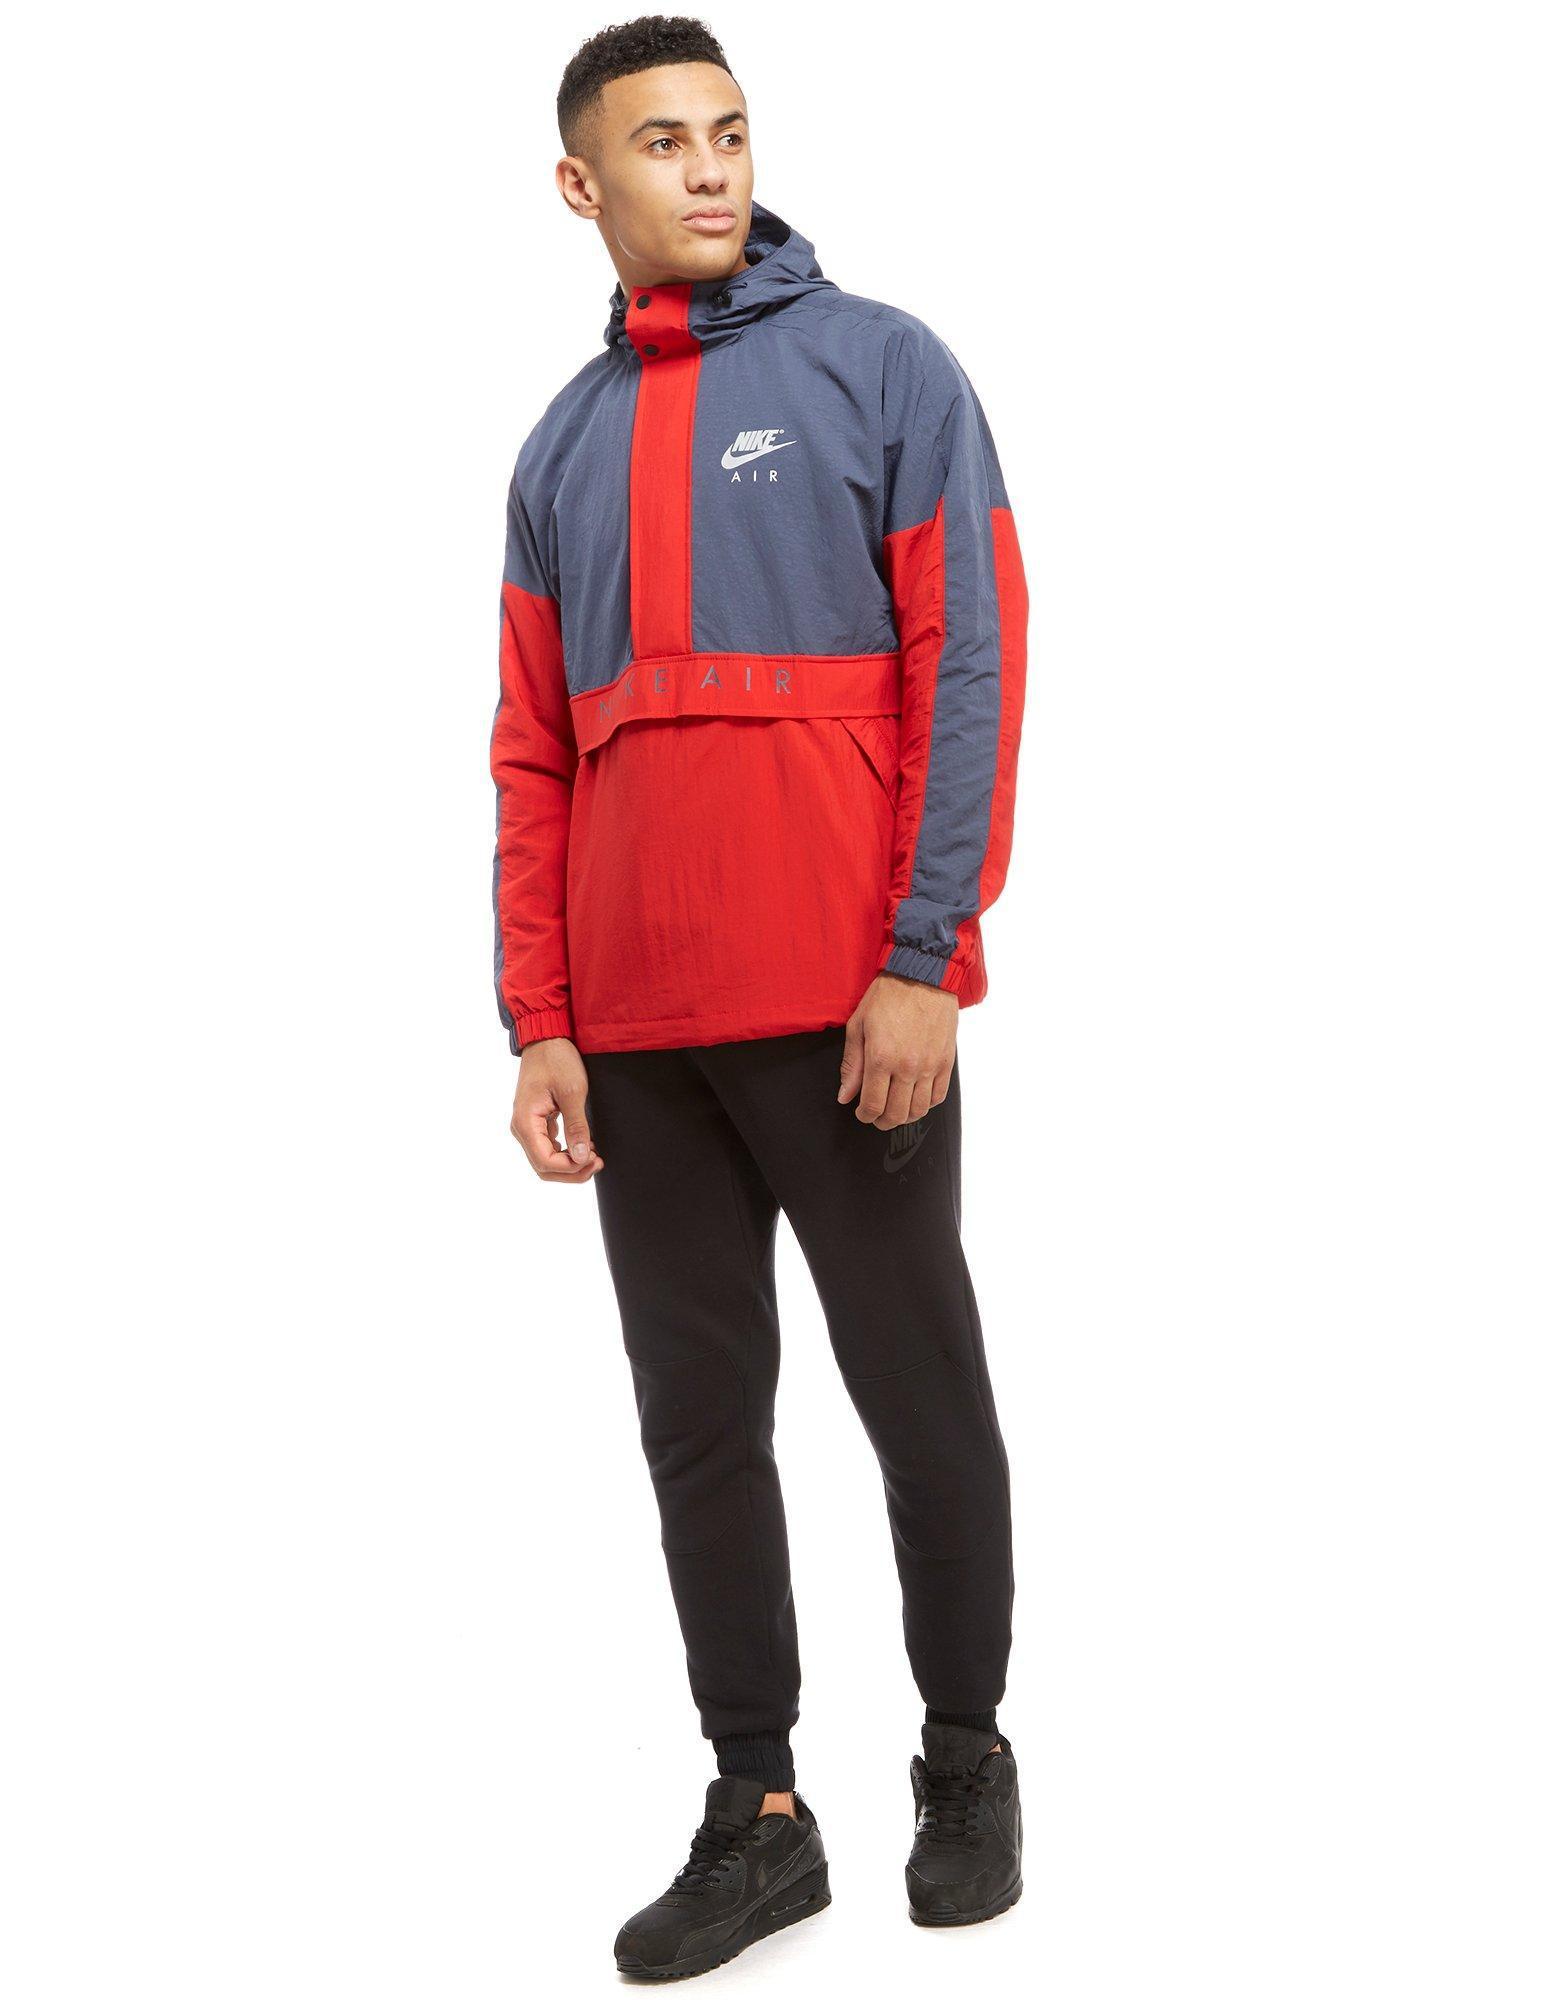 lyst nike air half zip jacket in red for men. Black Bedroom Furniture Sets. Home Design Ideas